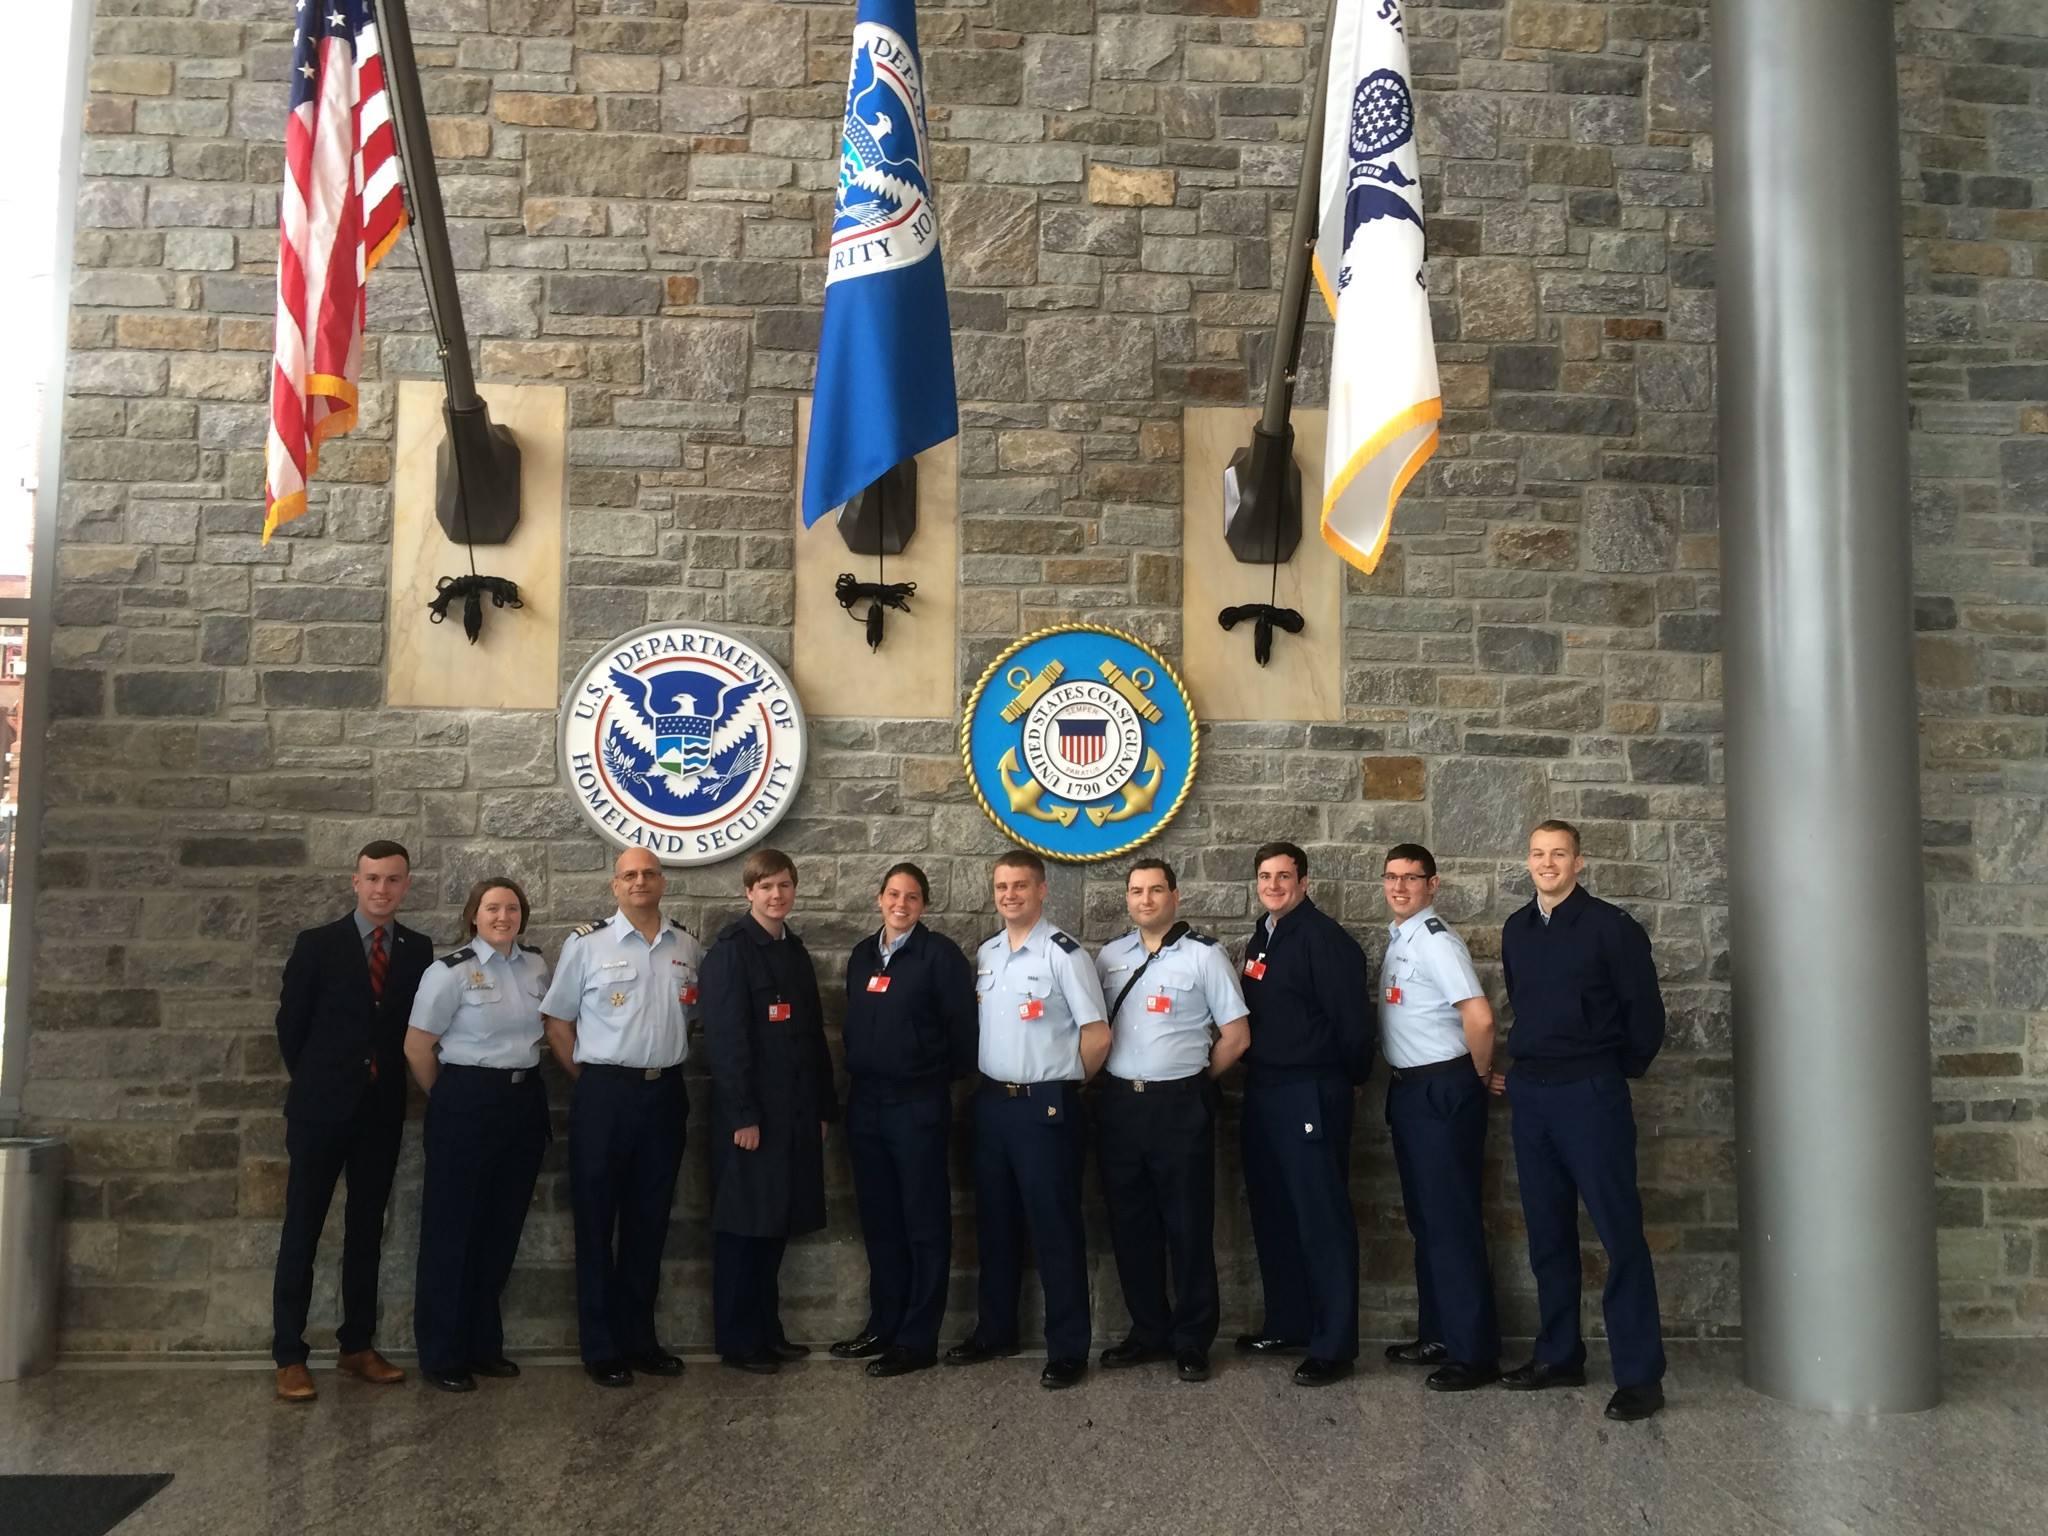 Members of the United States Coast Guard Auxiliary University Program at Coast Guard Headquarters.